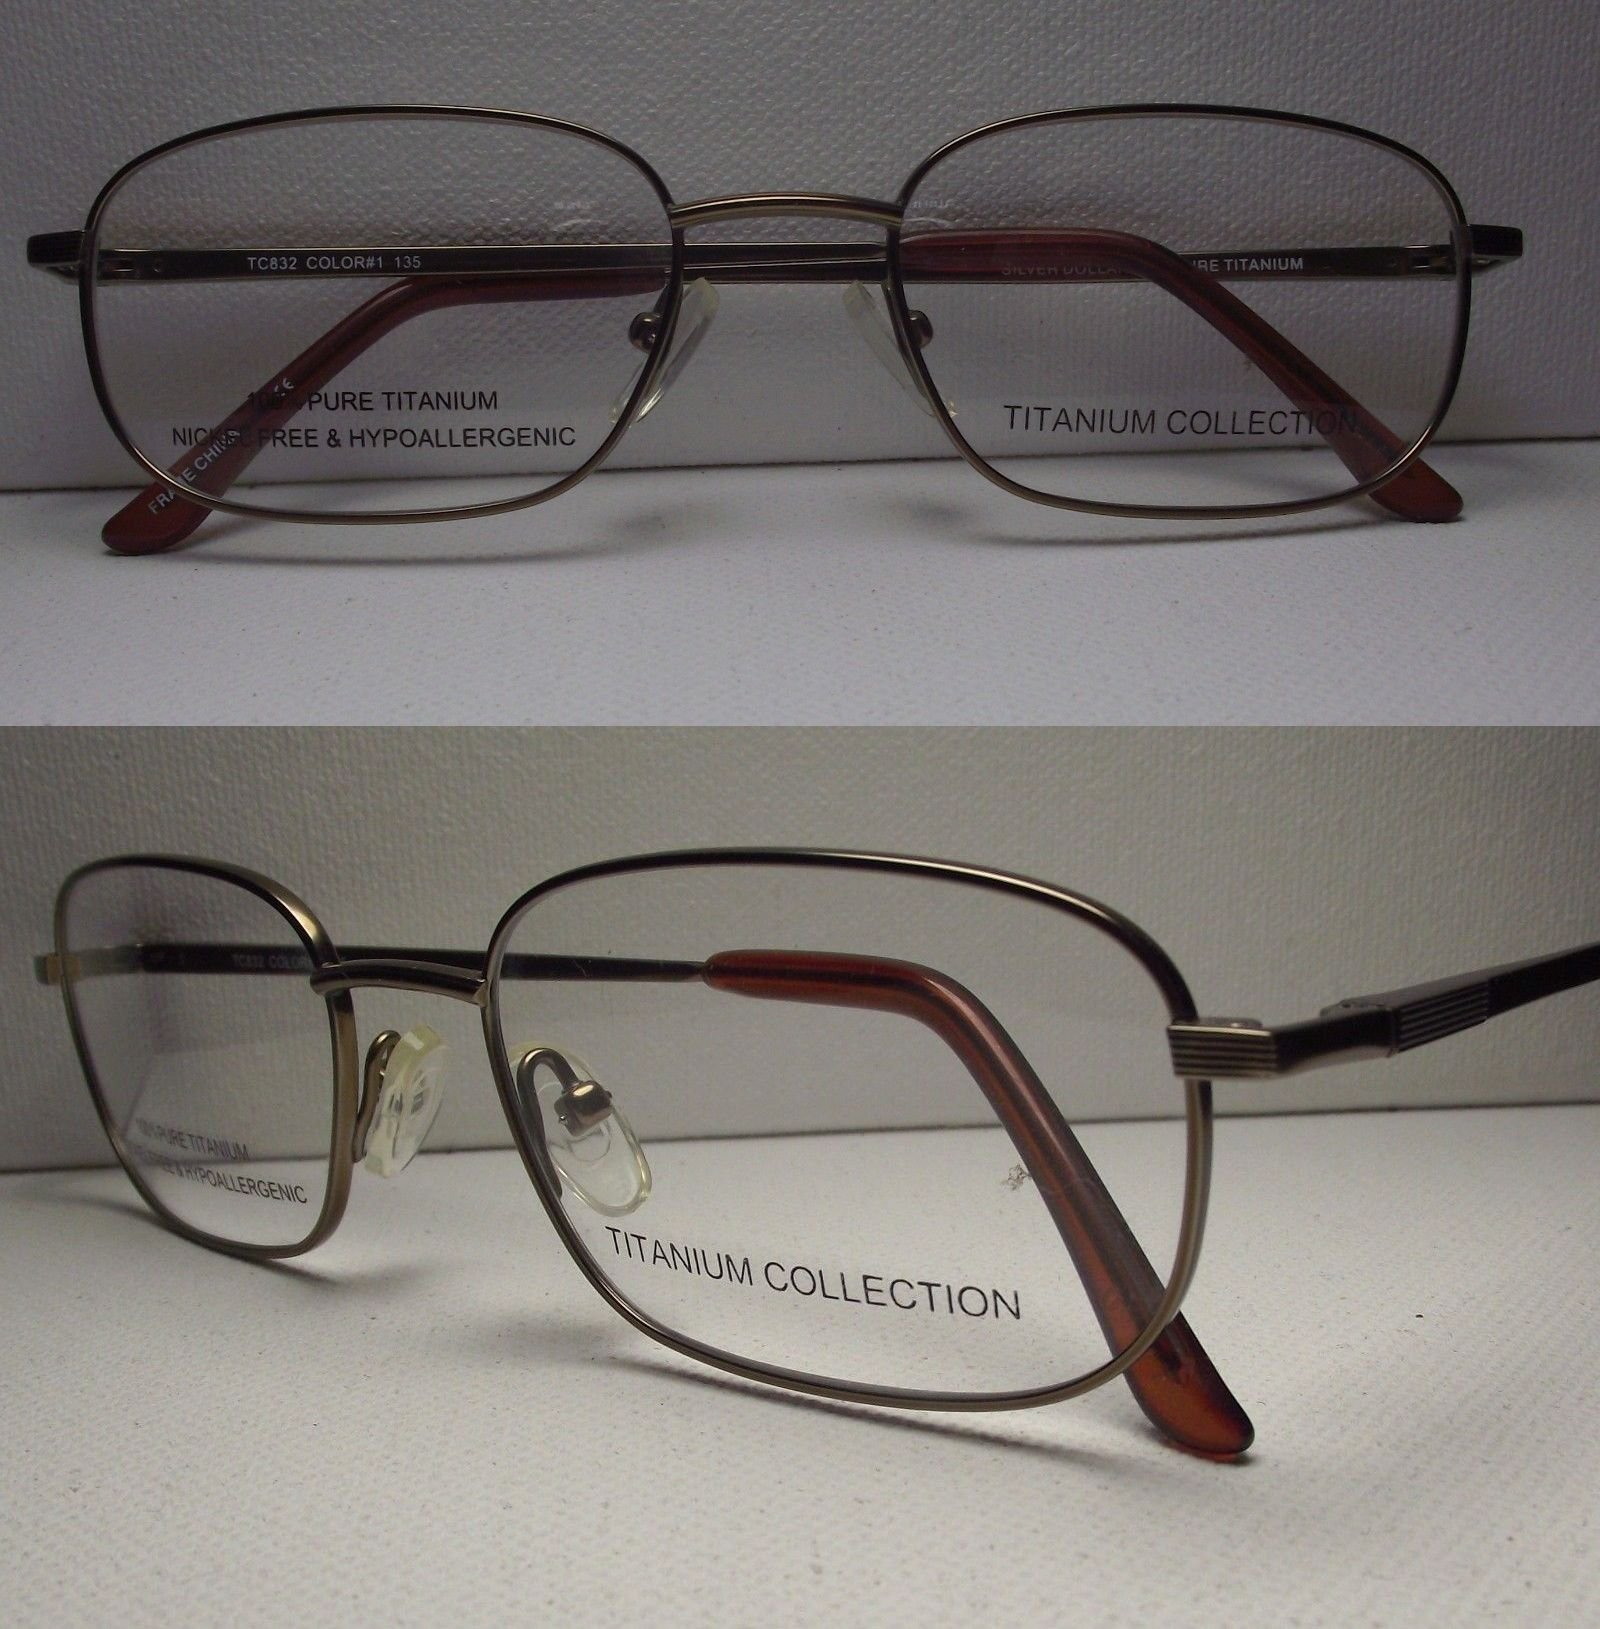 fashion eyewear clear glasses 179240 mens eyeglass frame titanium buy it now - Ebay Eyeglasses Frames